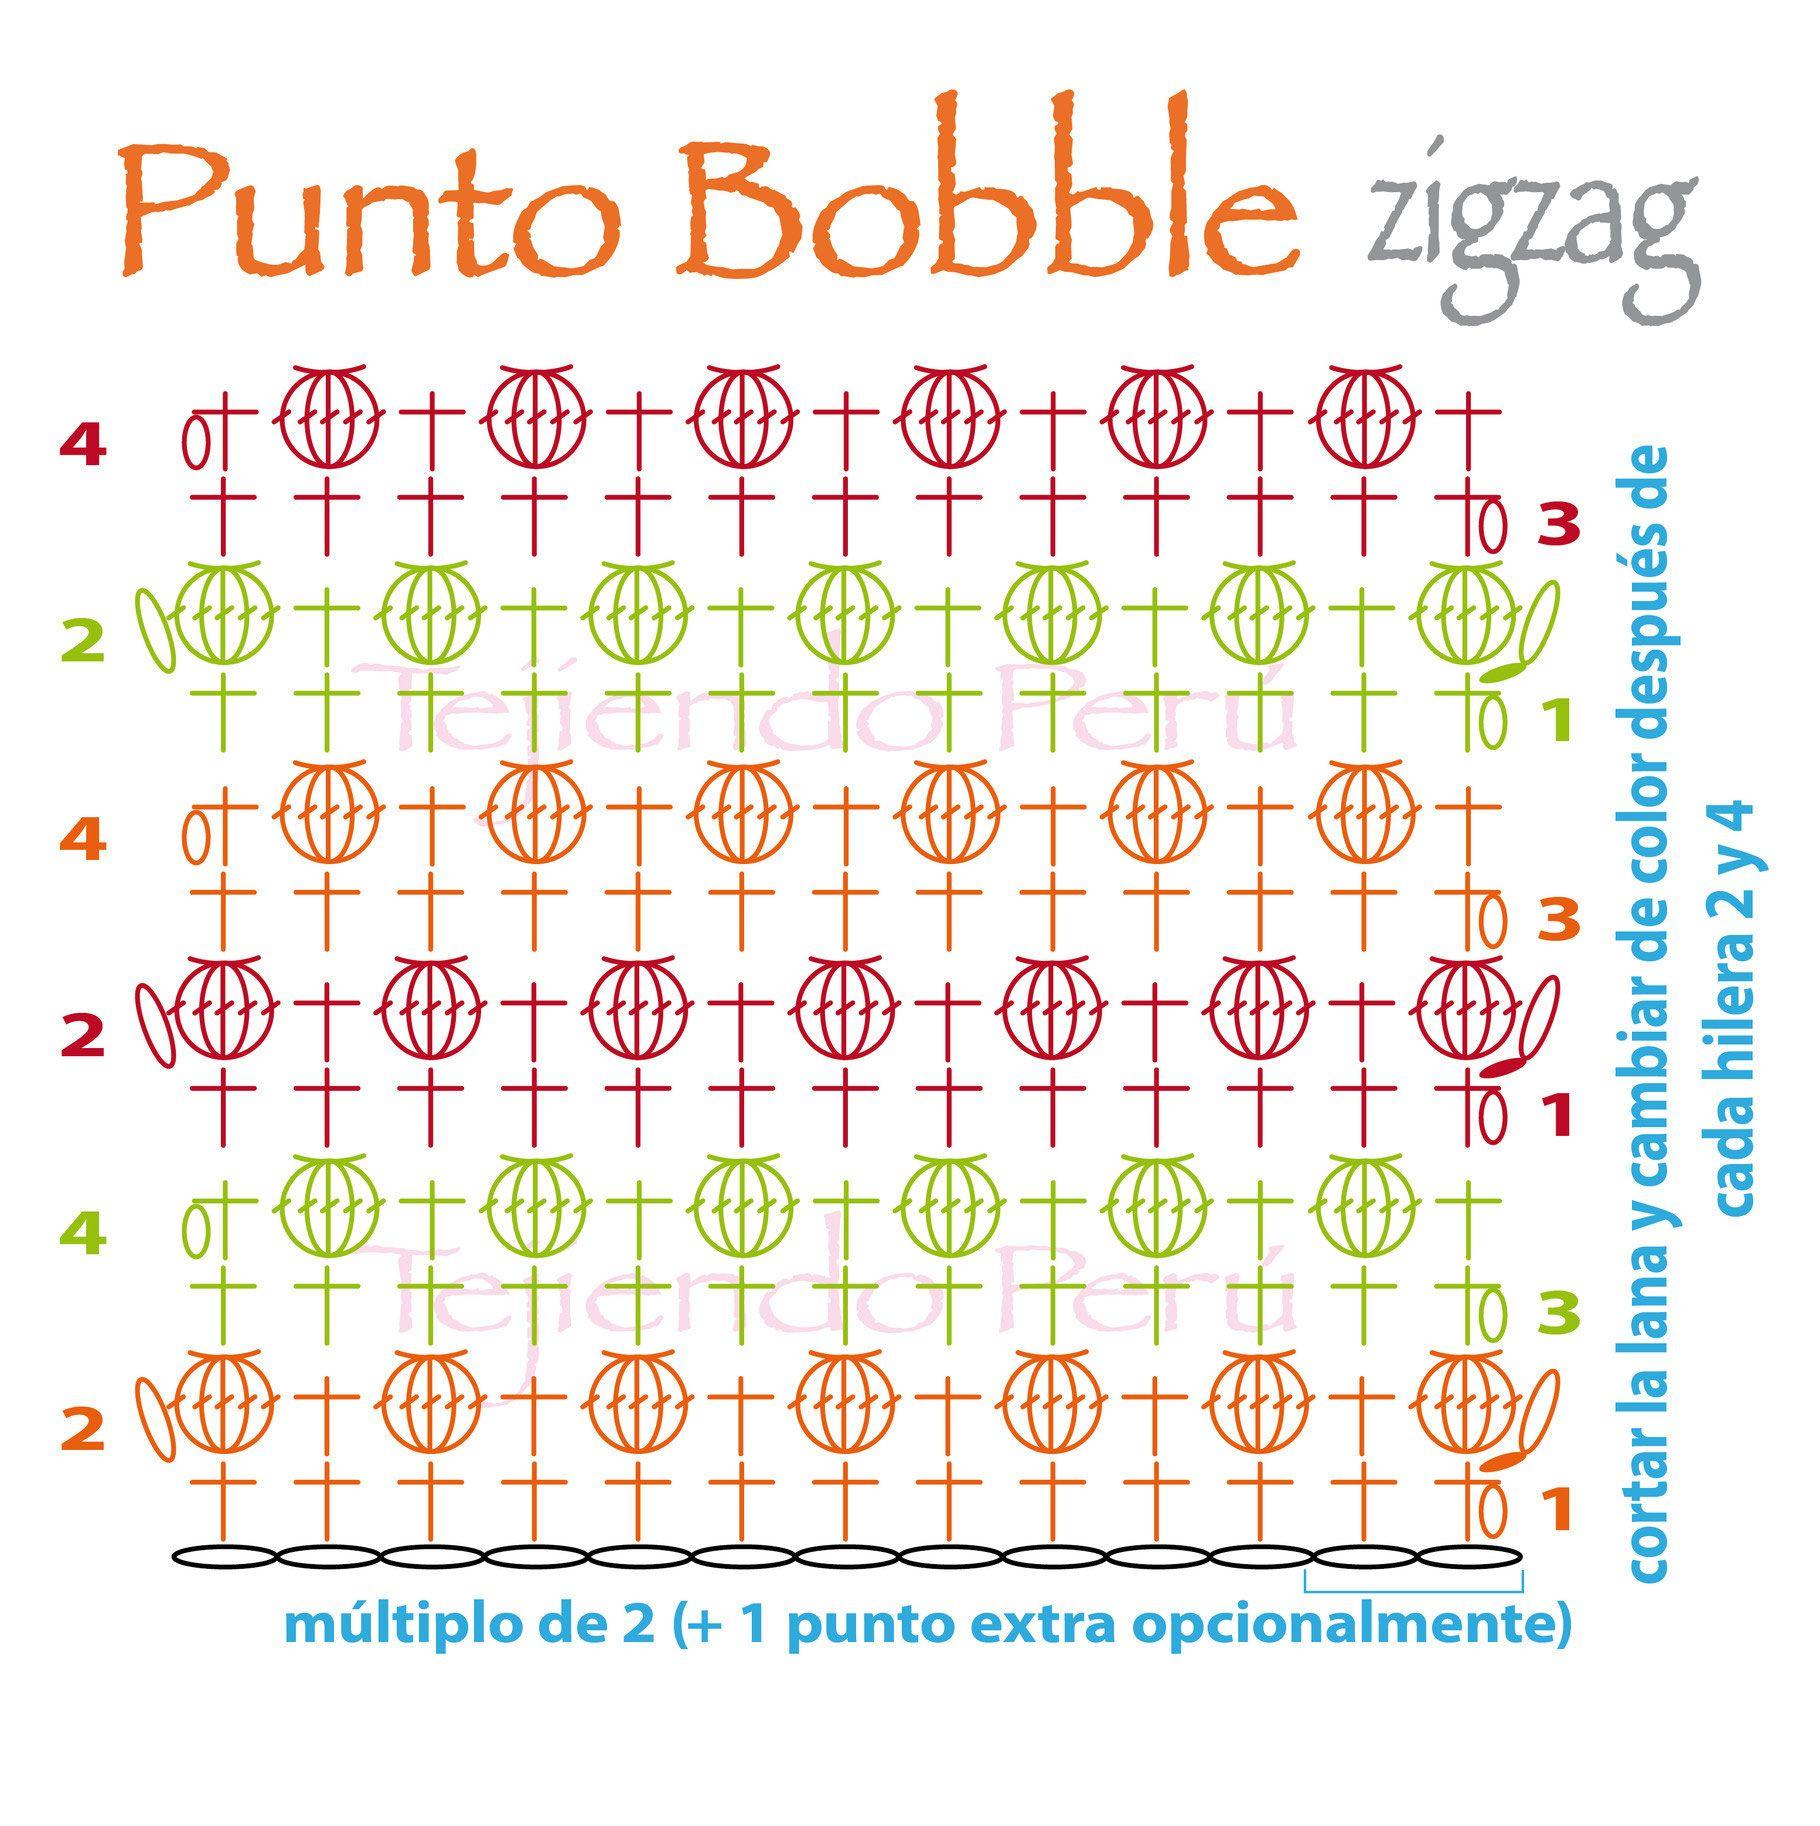 Punto bobble en zigzag tejido a crochet crochet bobble stitch how to read crochet charts bobble stitch bankloansurffo Images